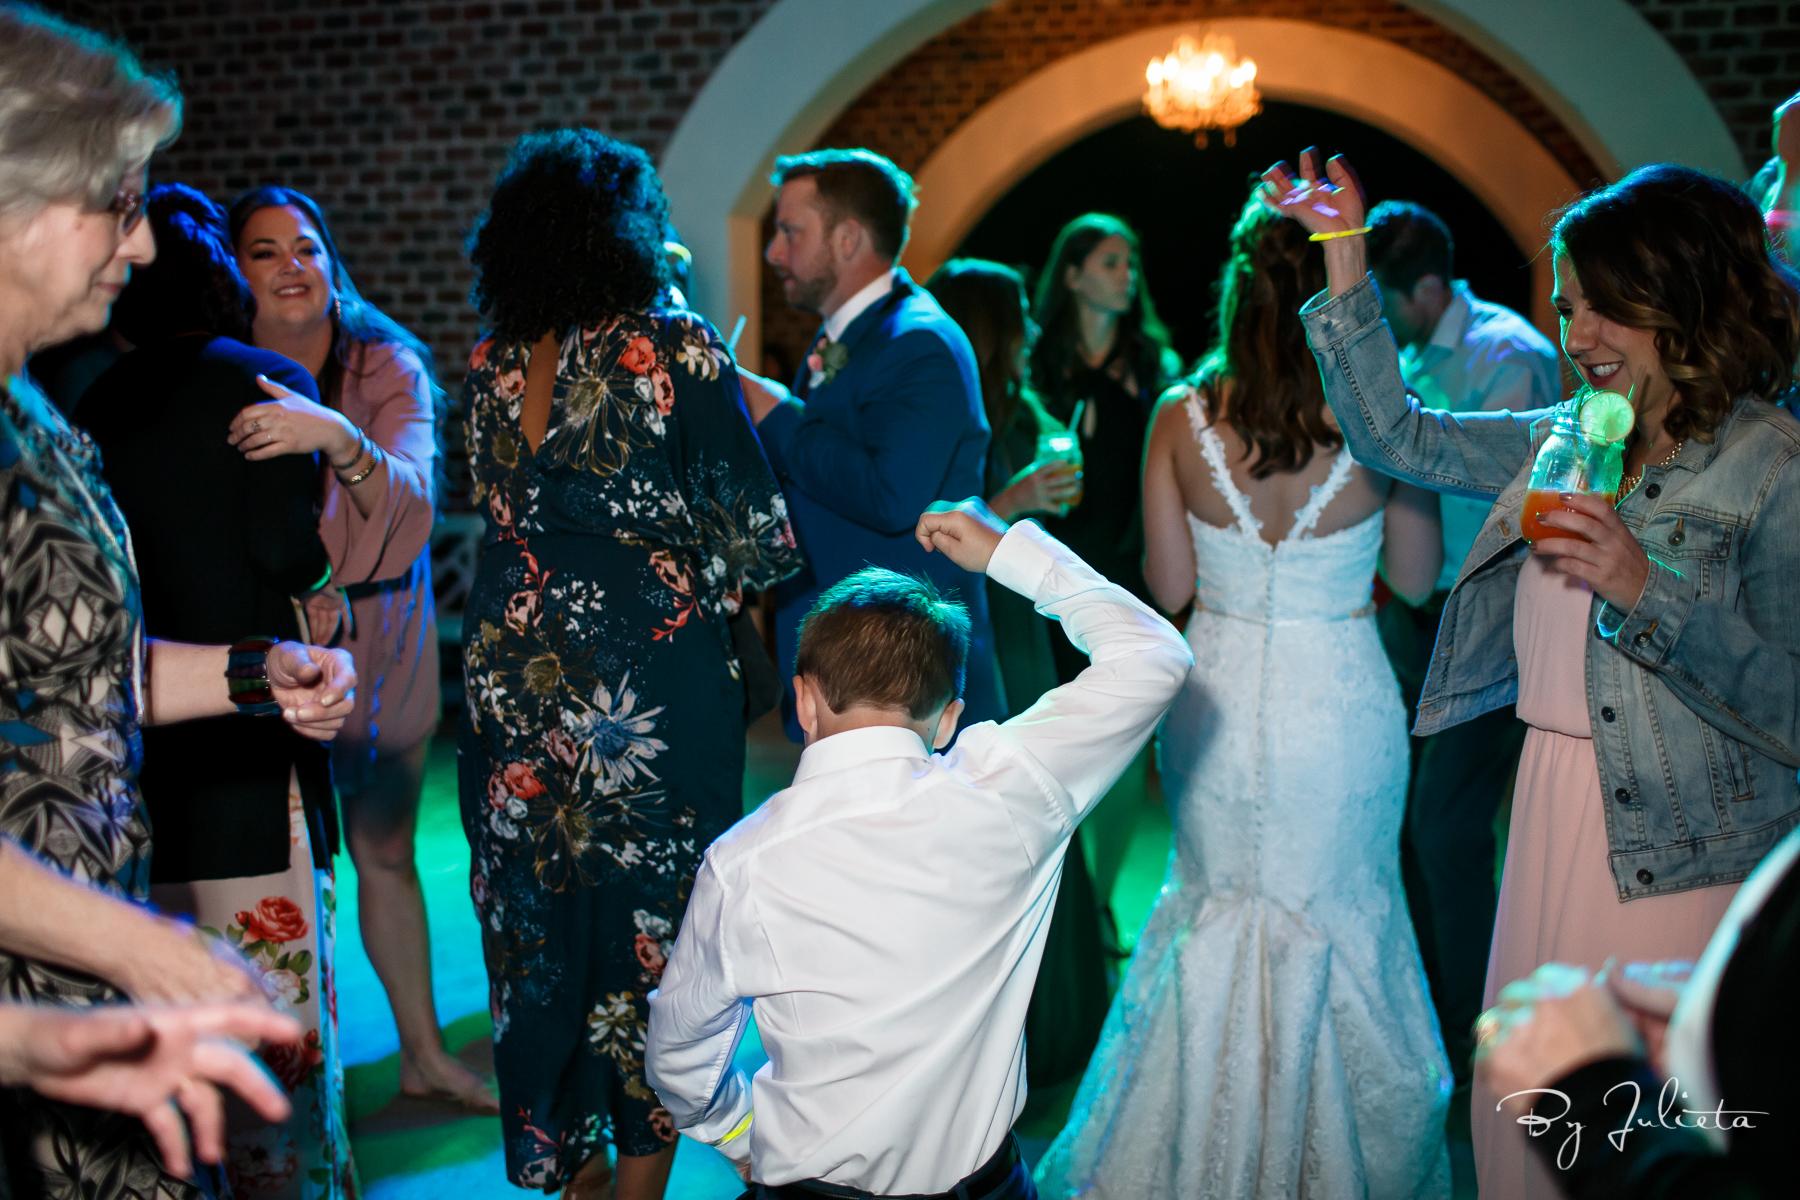 01.21.17 Cabo Wedding. Floras Farm. K+A. Julieta Amezcua Photography. (589 of 637).jpg